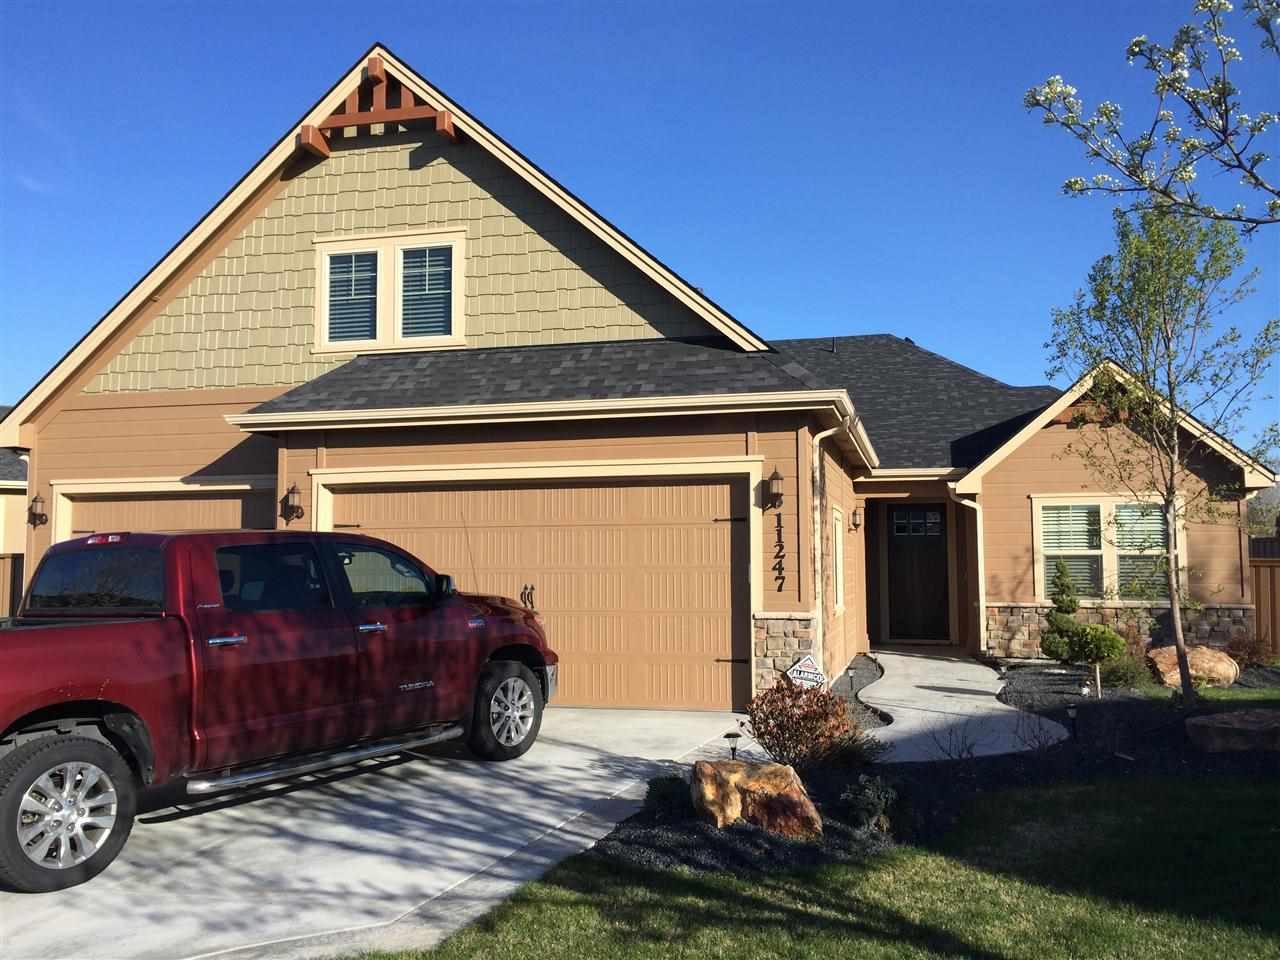 11247 Stepney, Boise, Idaho 83709, 4 Bedrooms, 3 Bathrooms, Rental For Rent, Price $2,200, 98676967